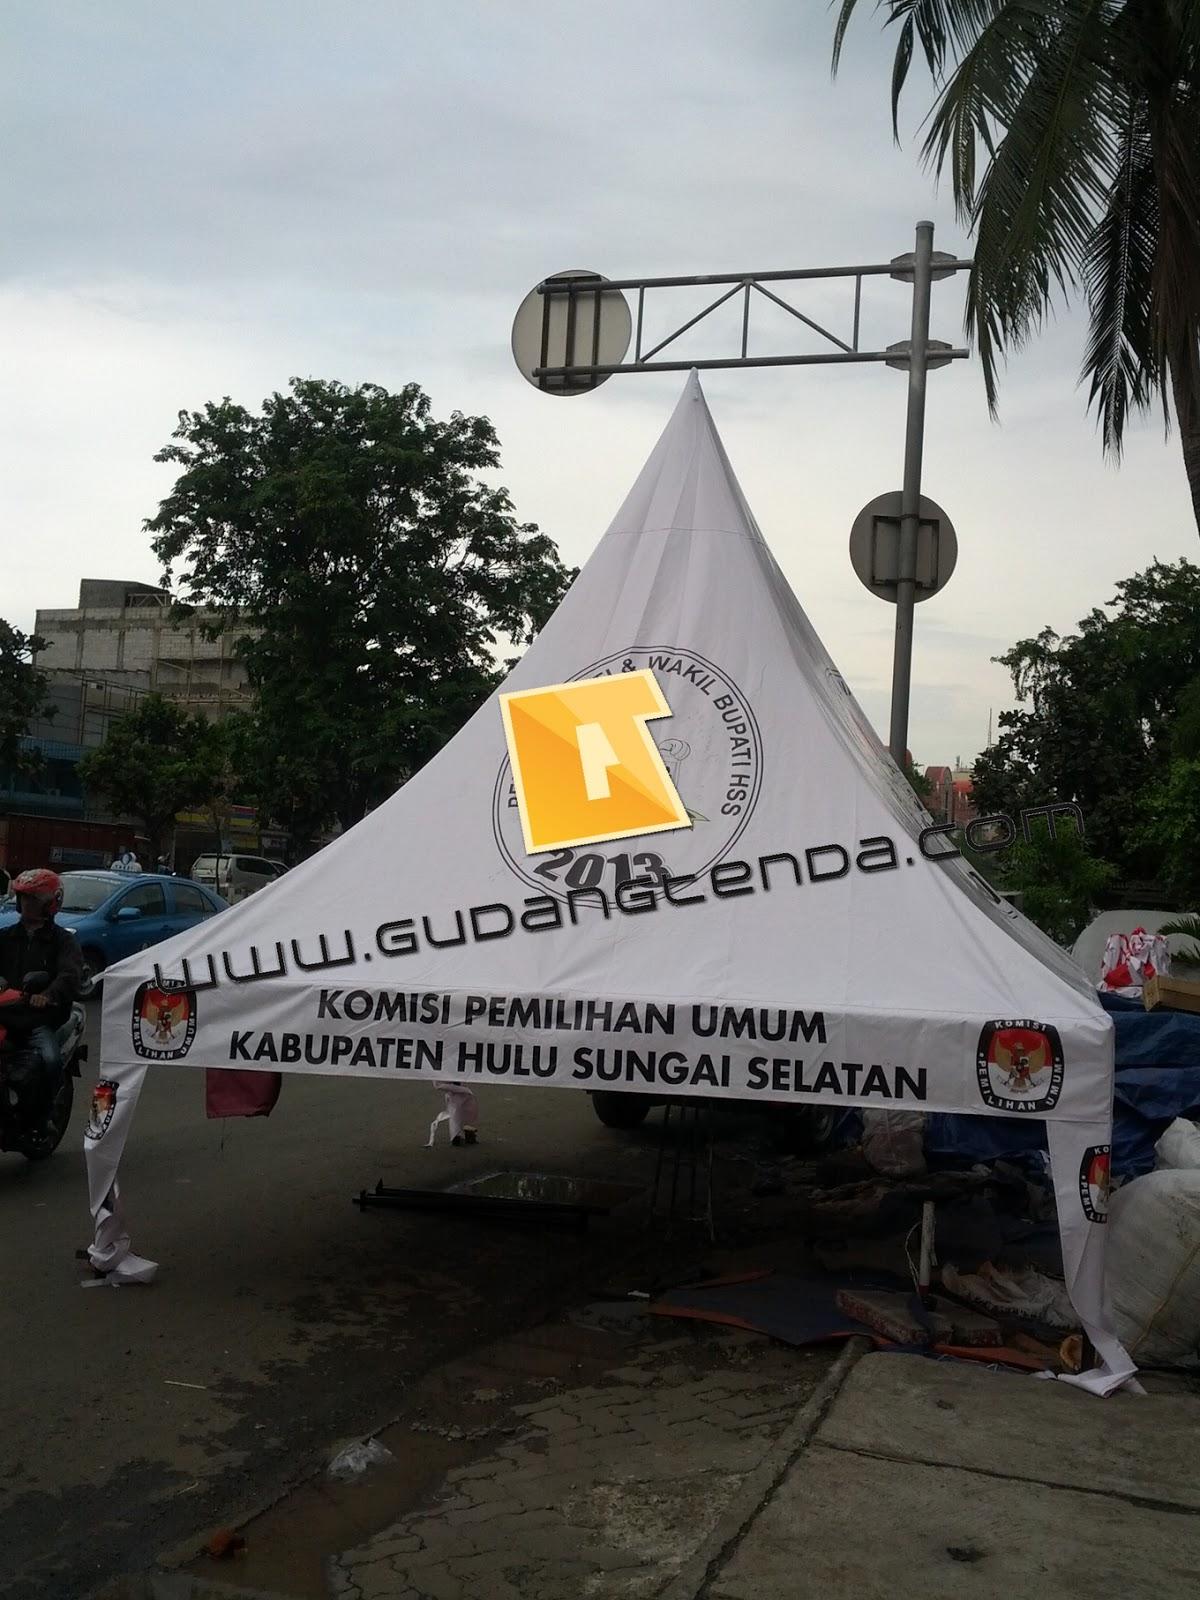 Tenda Promosi Produk, Tenda Kerucut promosi